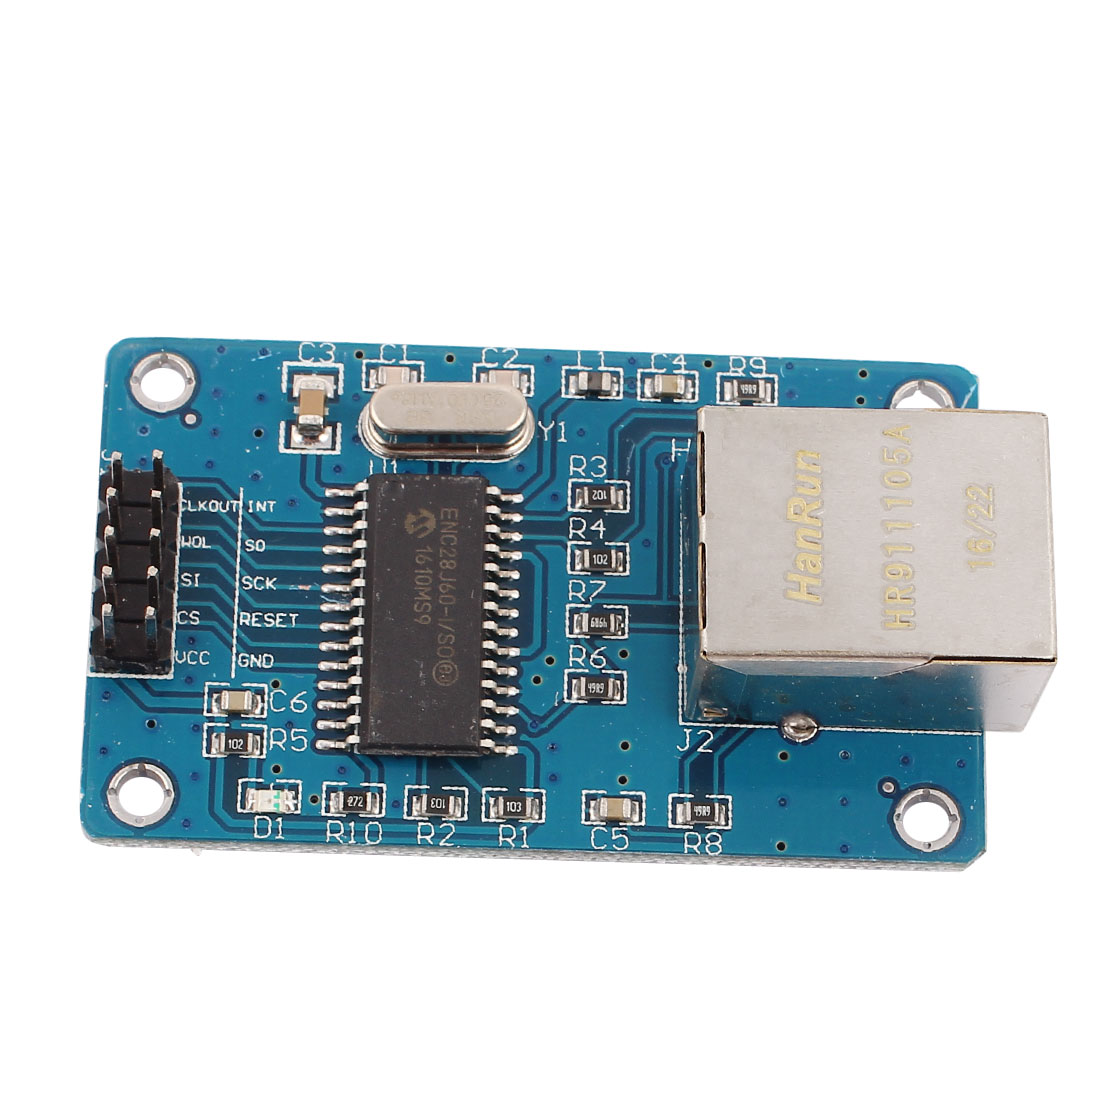 ENC28J60 SPI Interface Ethernet LAN Network Module AVR ARM PIC - image 2 de 3